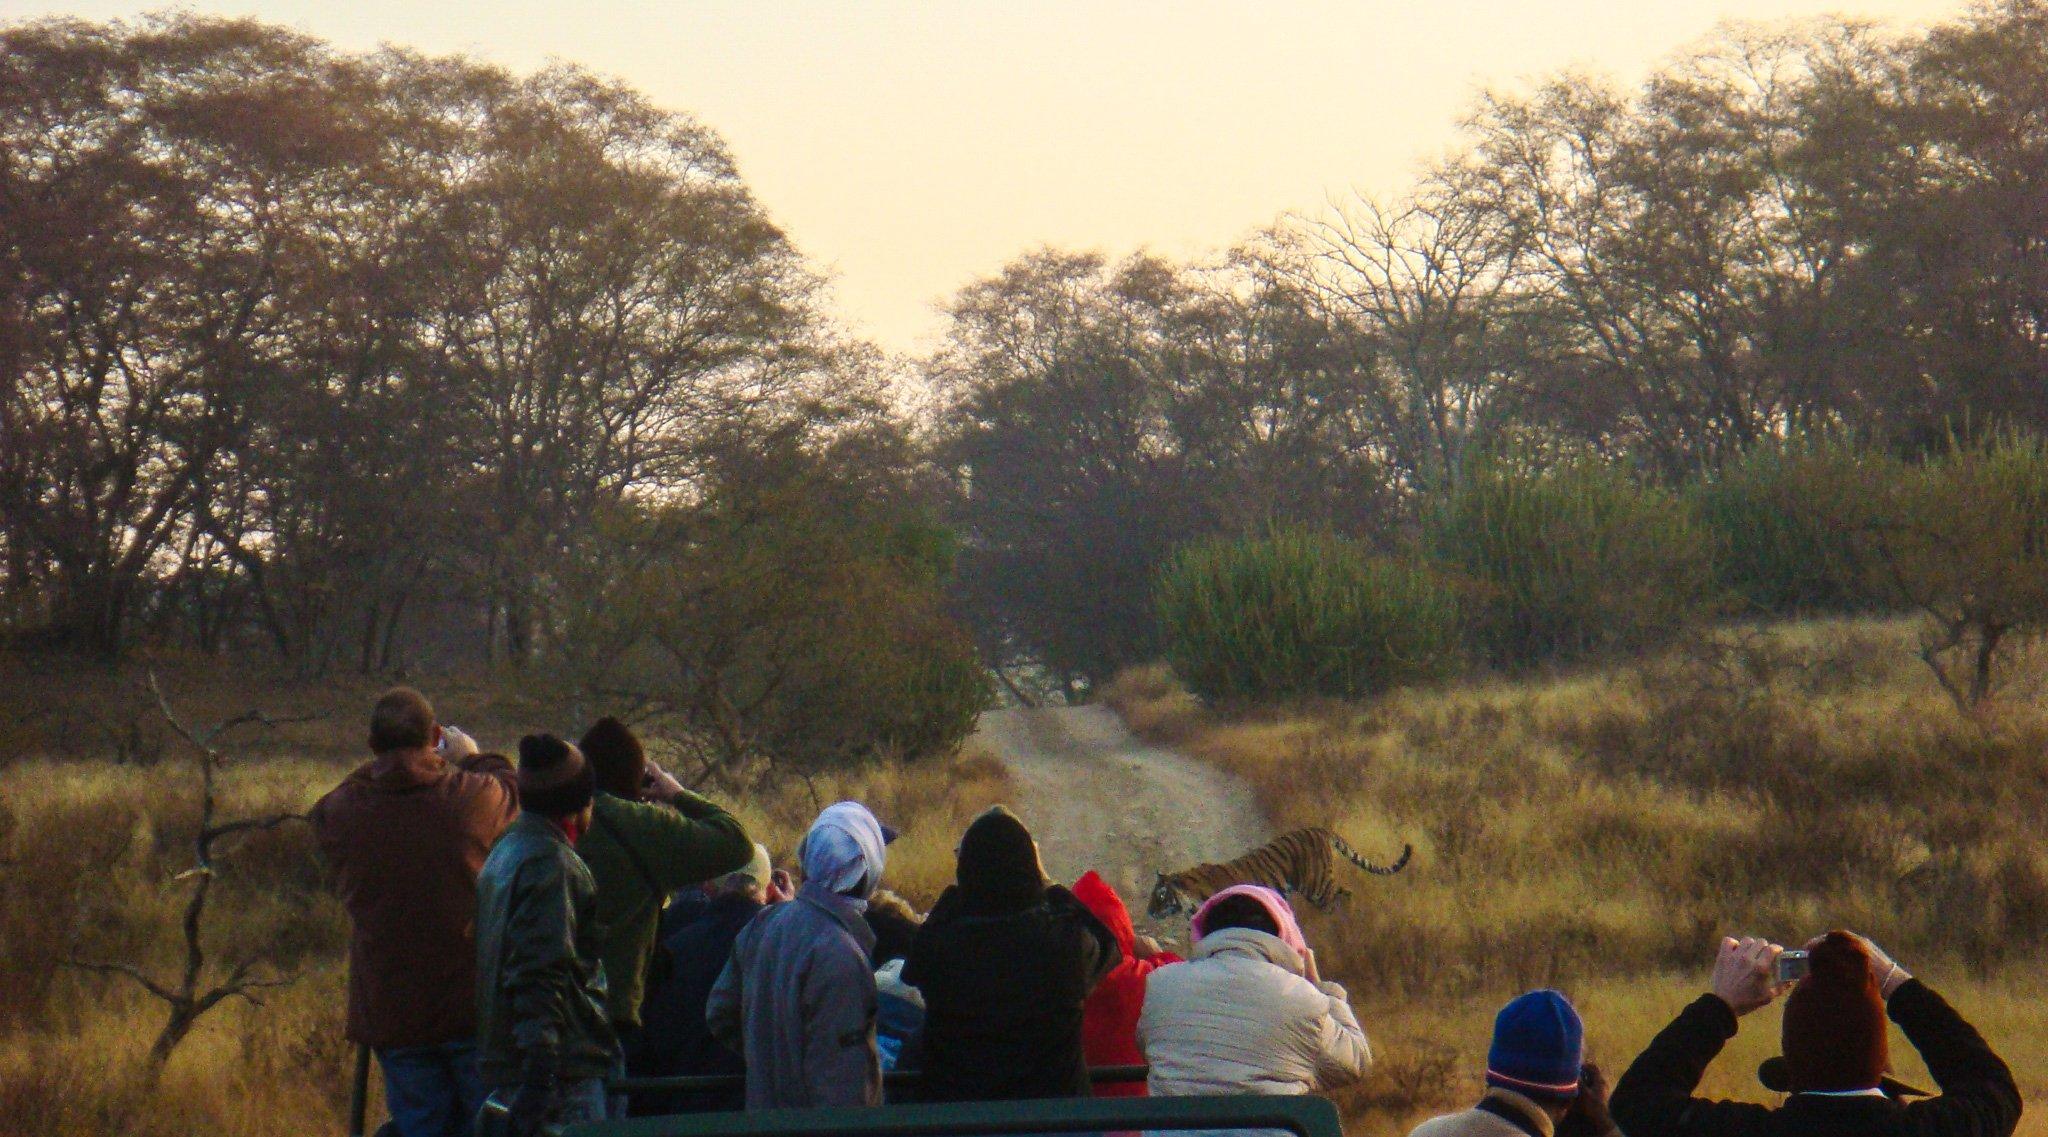 Tiger Tourists